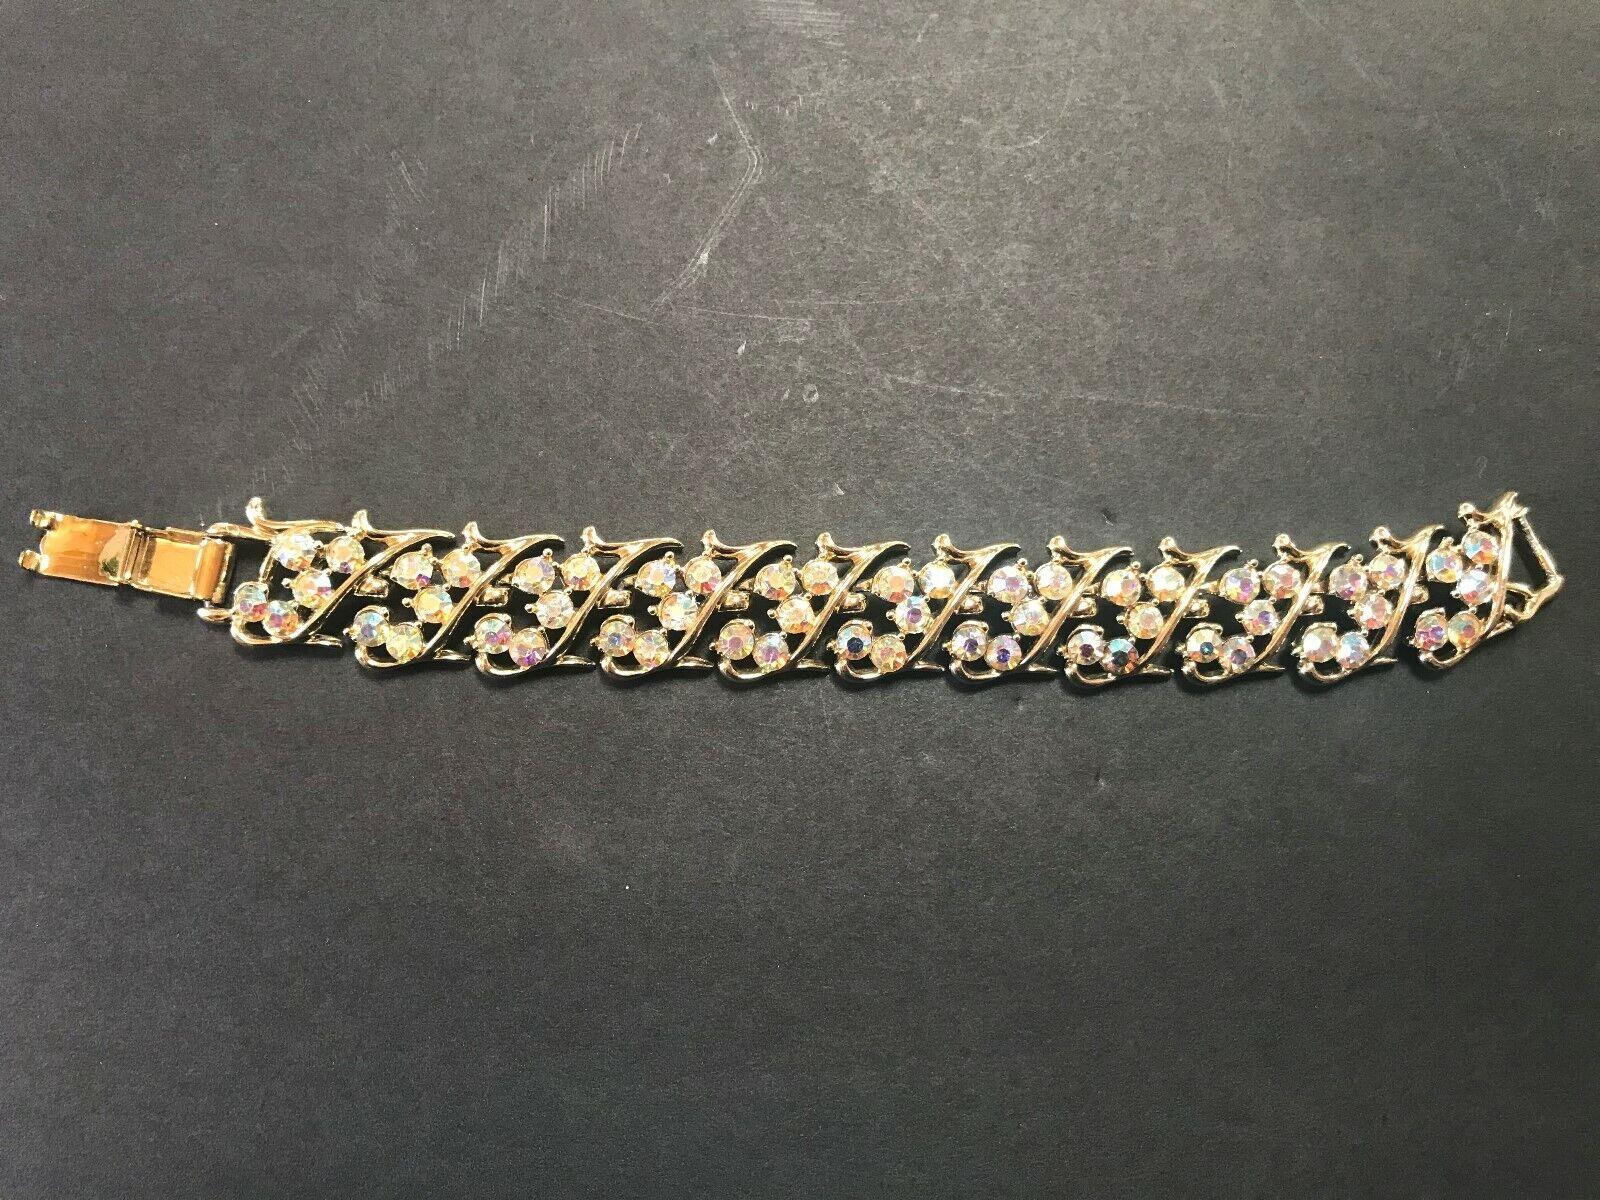 Gold Tone Vintage Pakula Figural Tribal Pendant 2 38 x 1 58 Inches